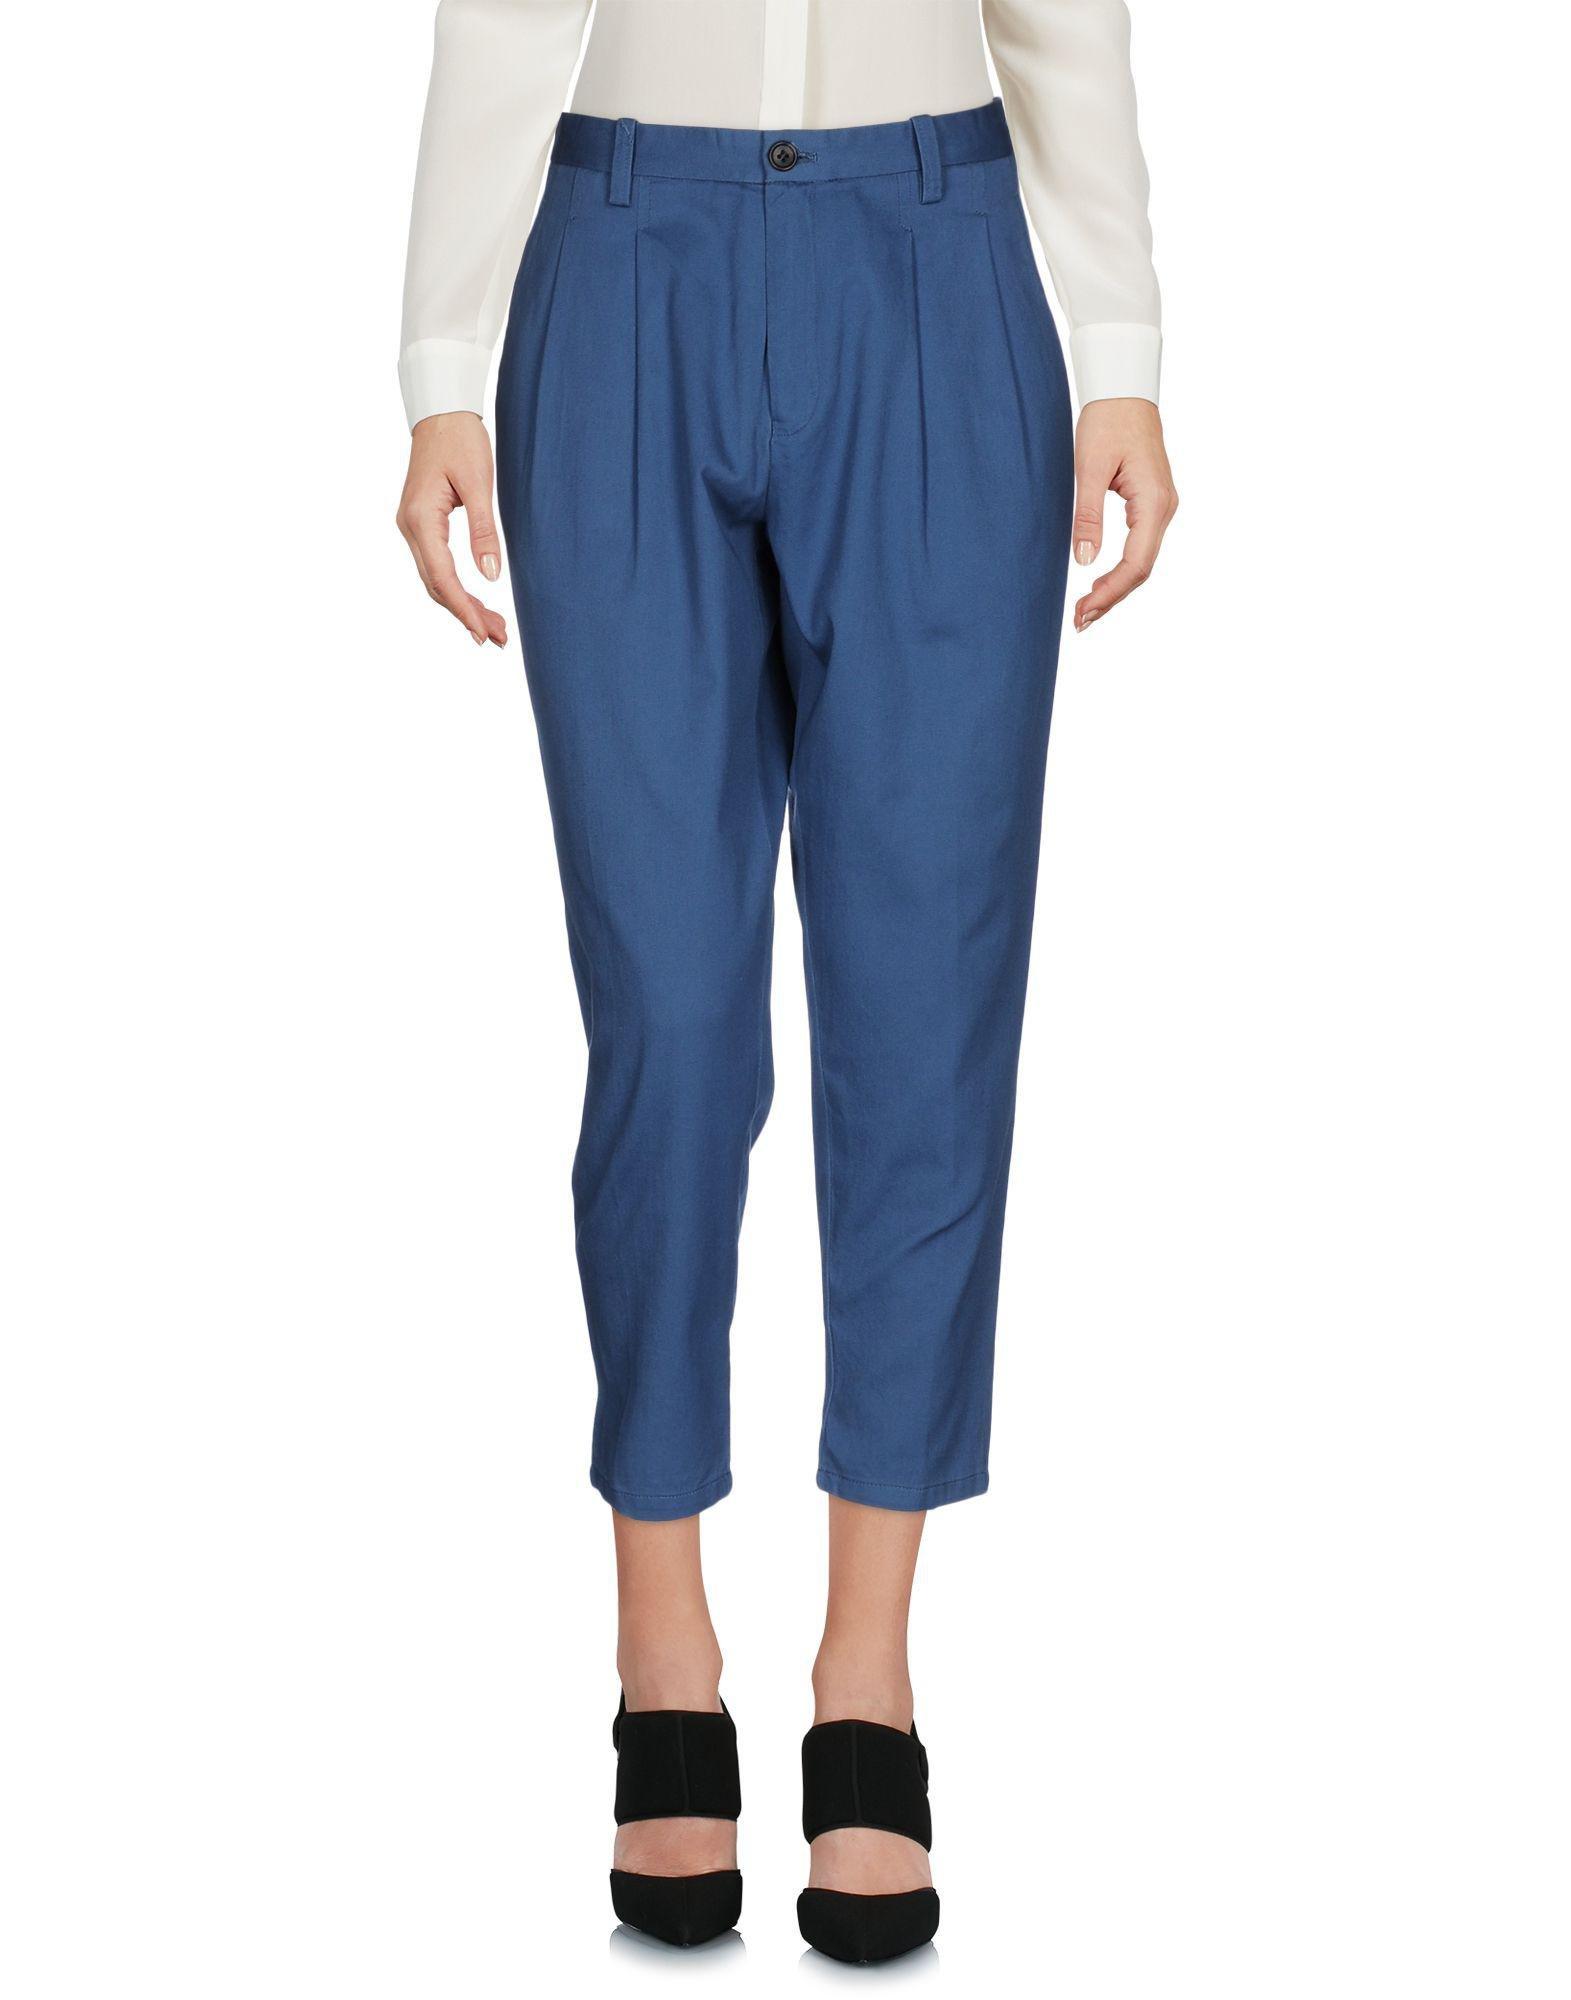 Les Pantalons - 3/4 Pantalon De Longueur Bleu Bleu Japon JJG4u